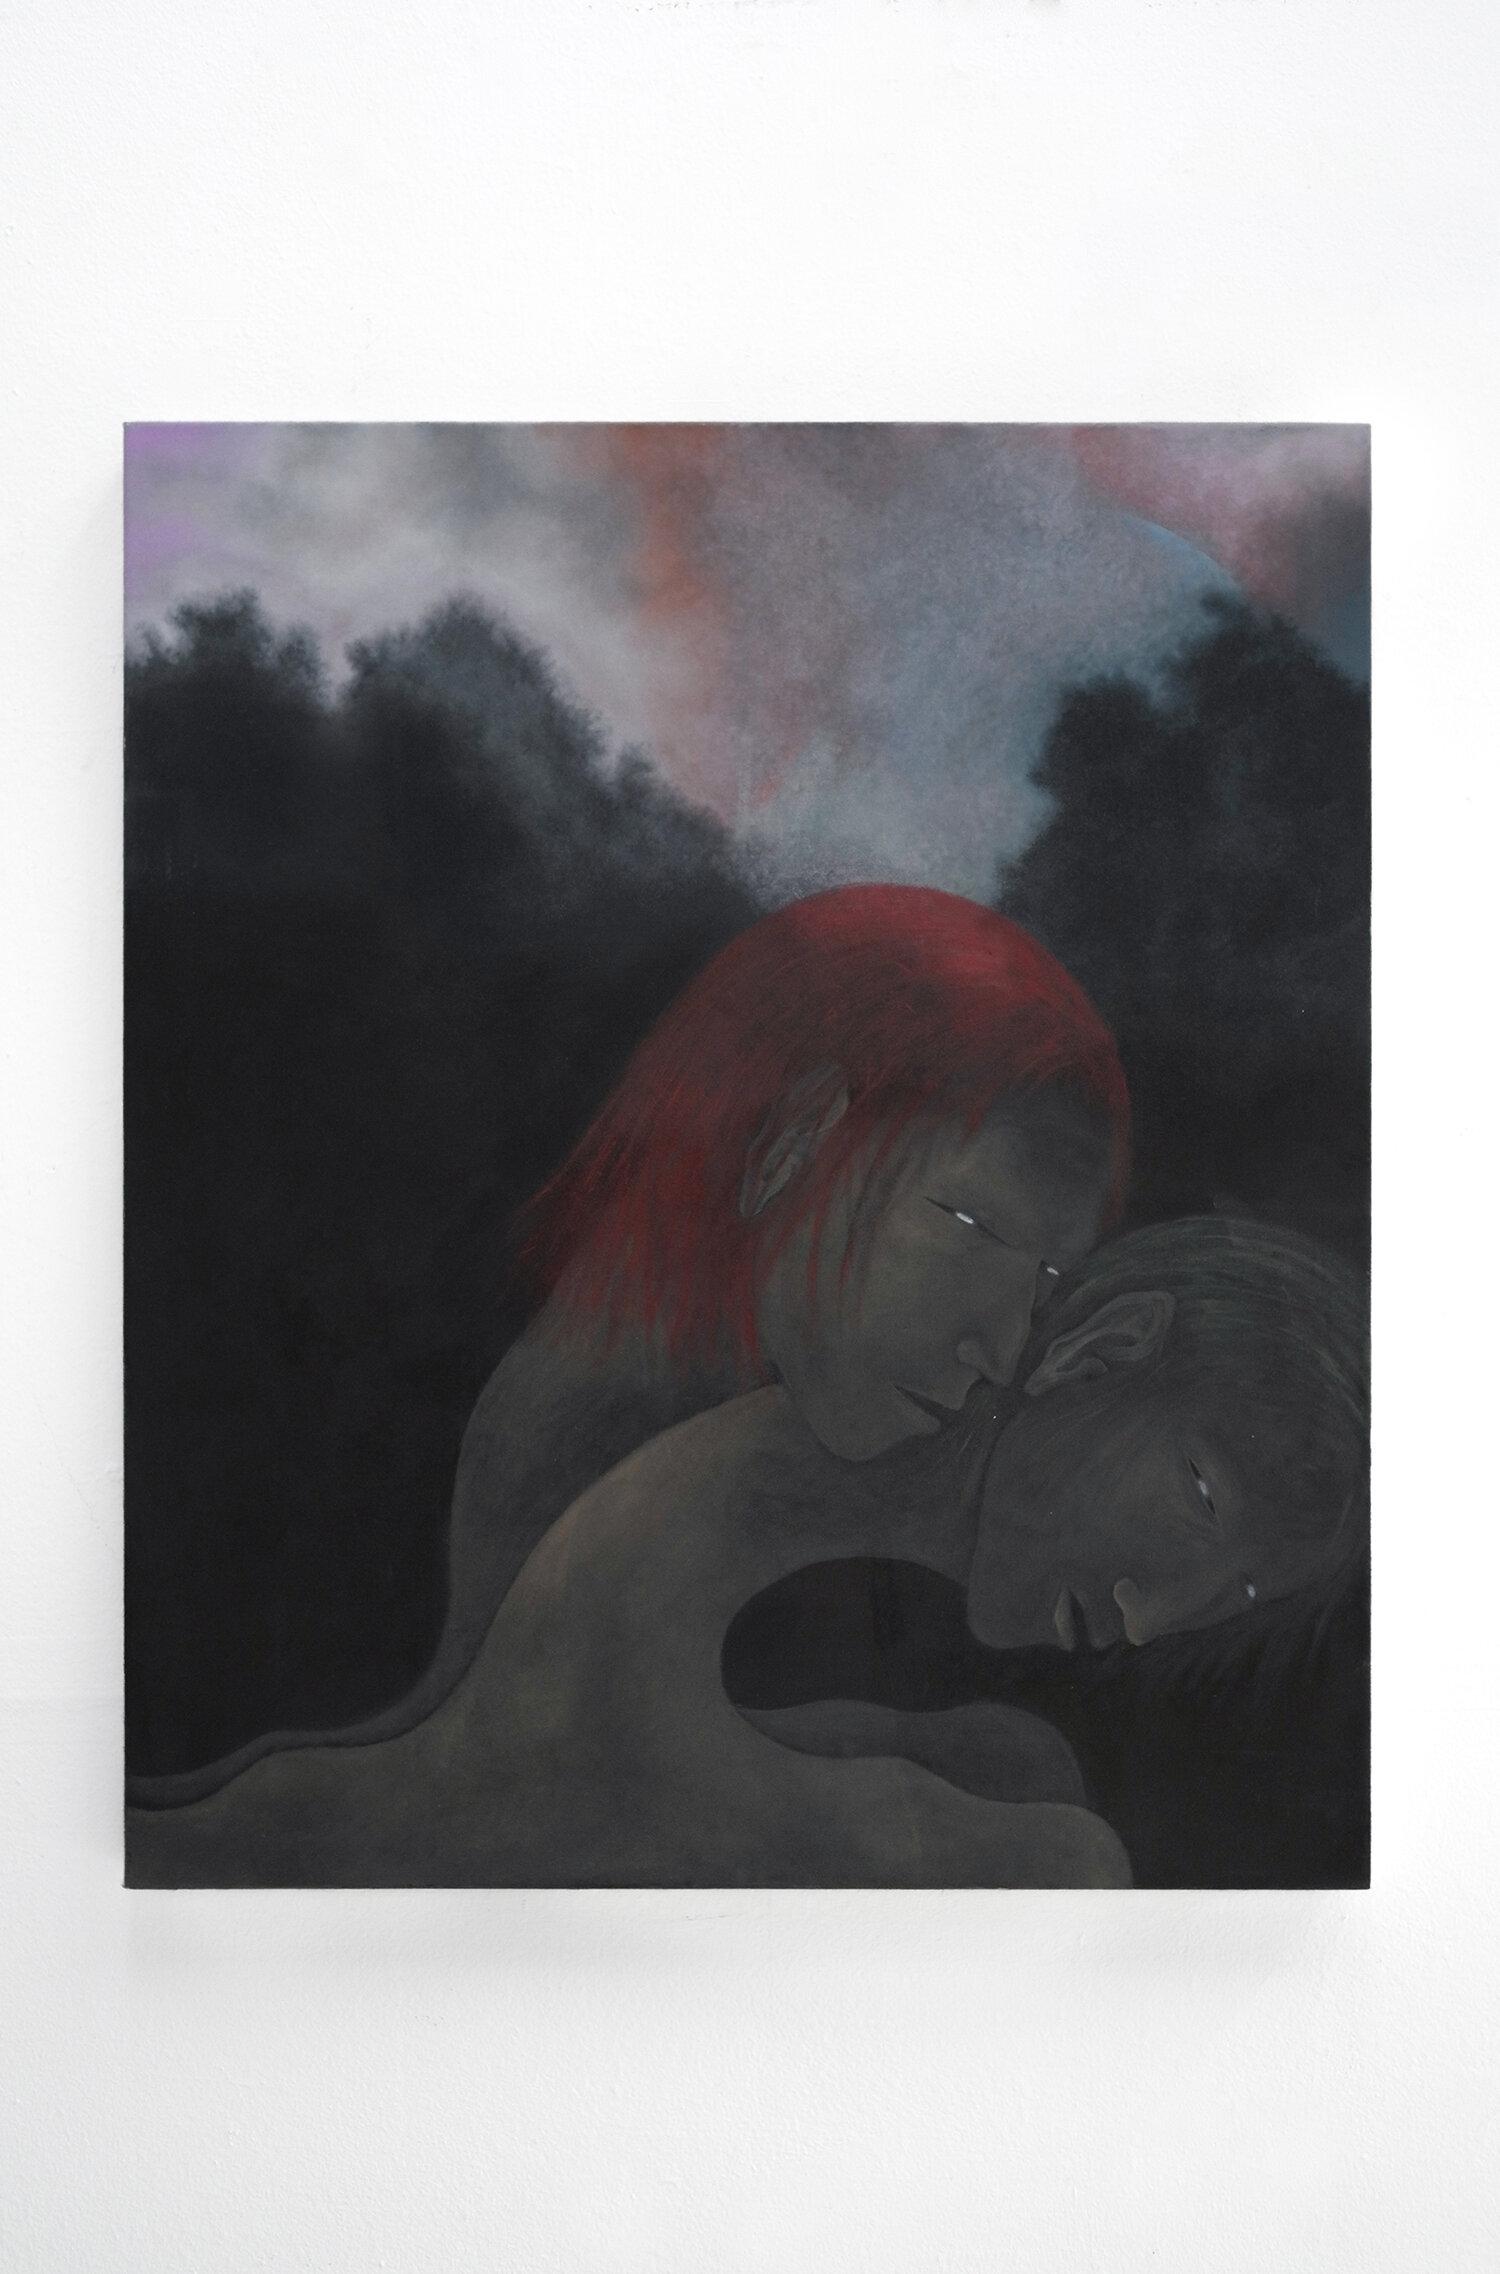 Sonya Derviz, Good at night III, 2019